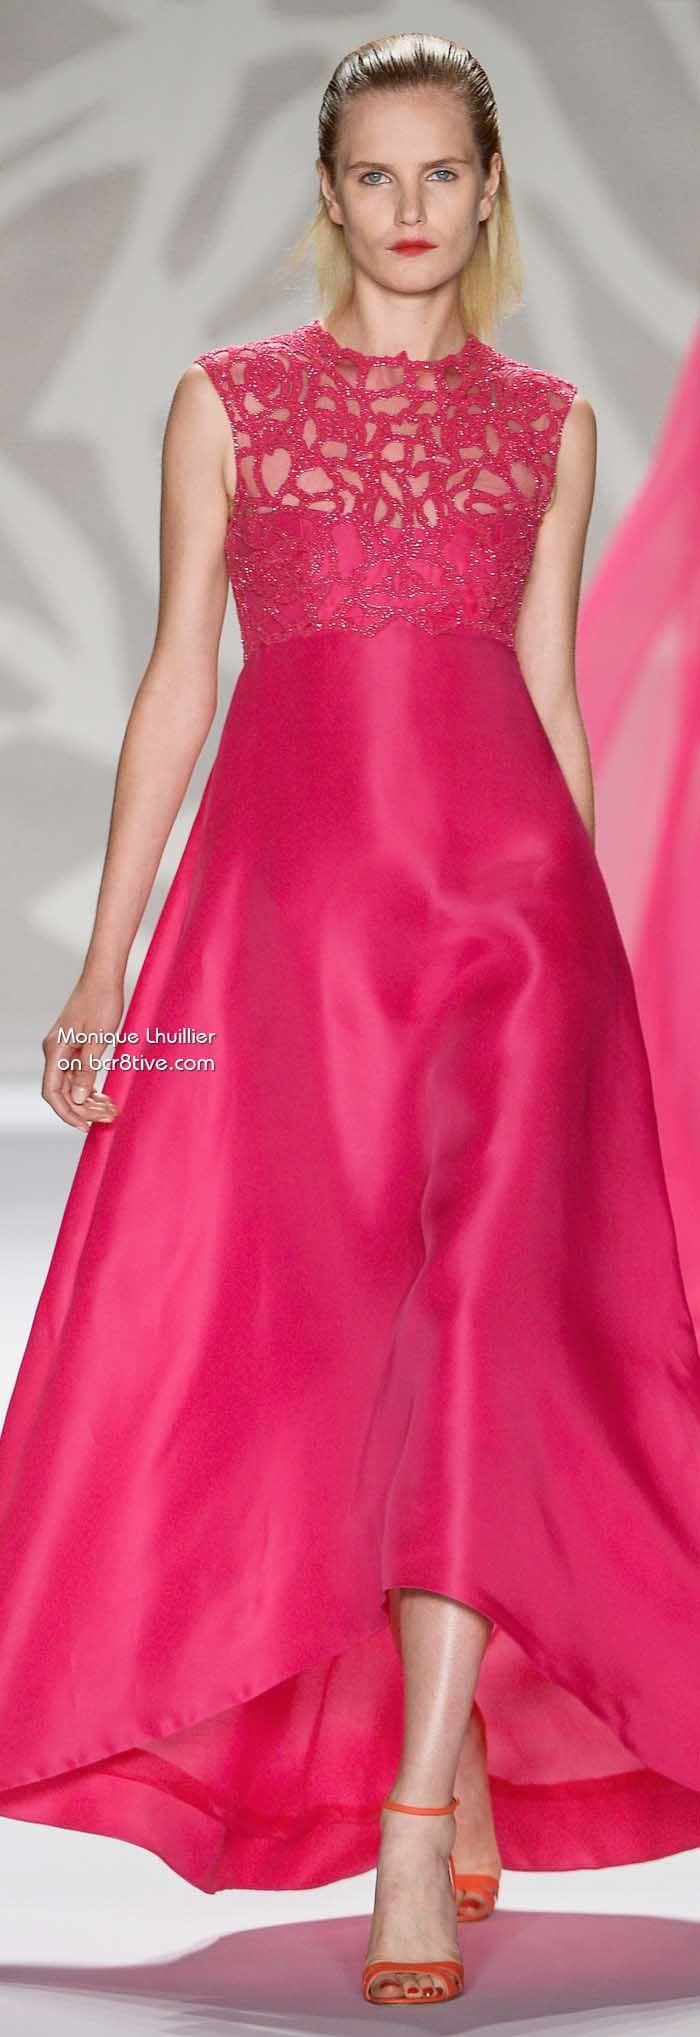 36 best Second dress/reception Ideas images on Pinterest ...